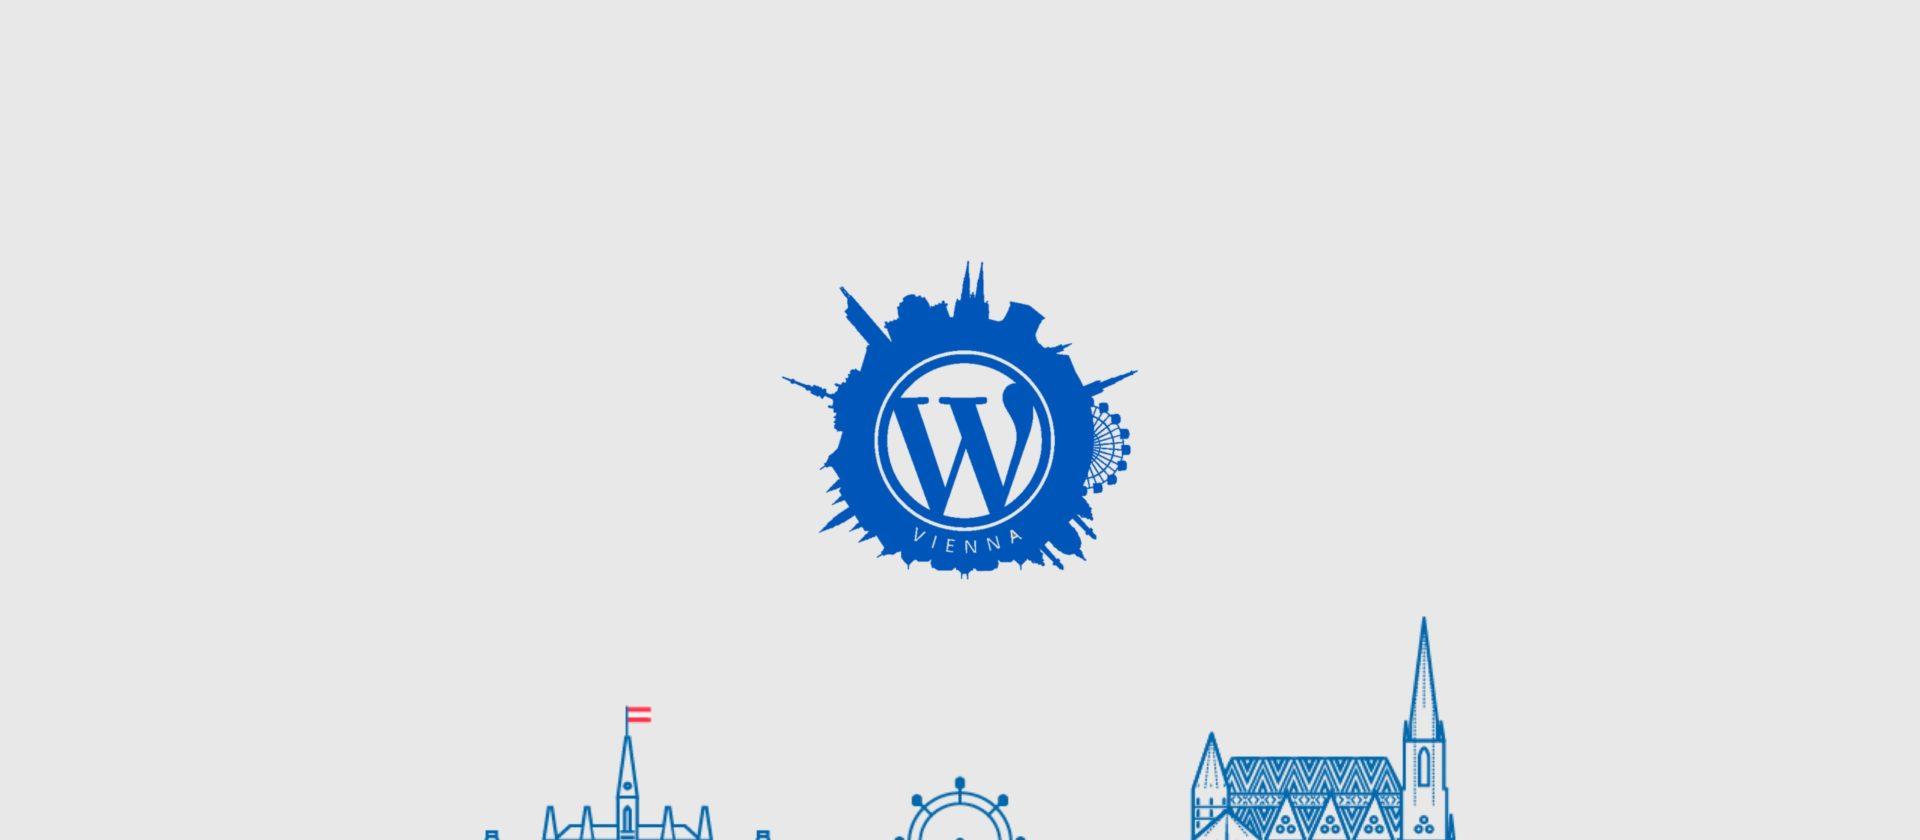 WordPress WordCamp Wien 2017 logo